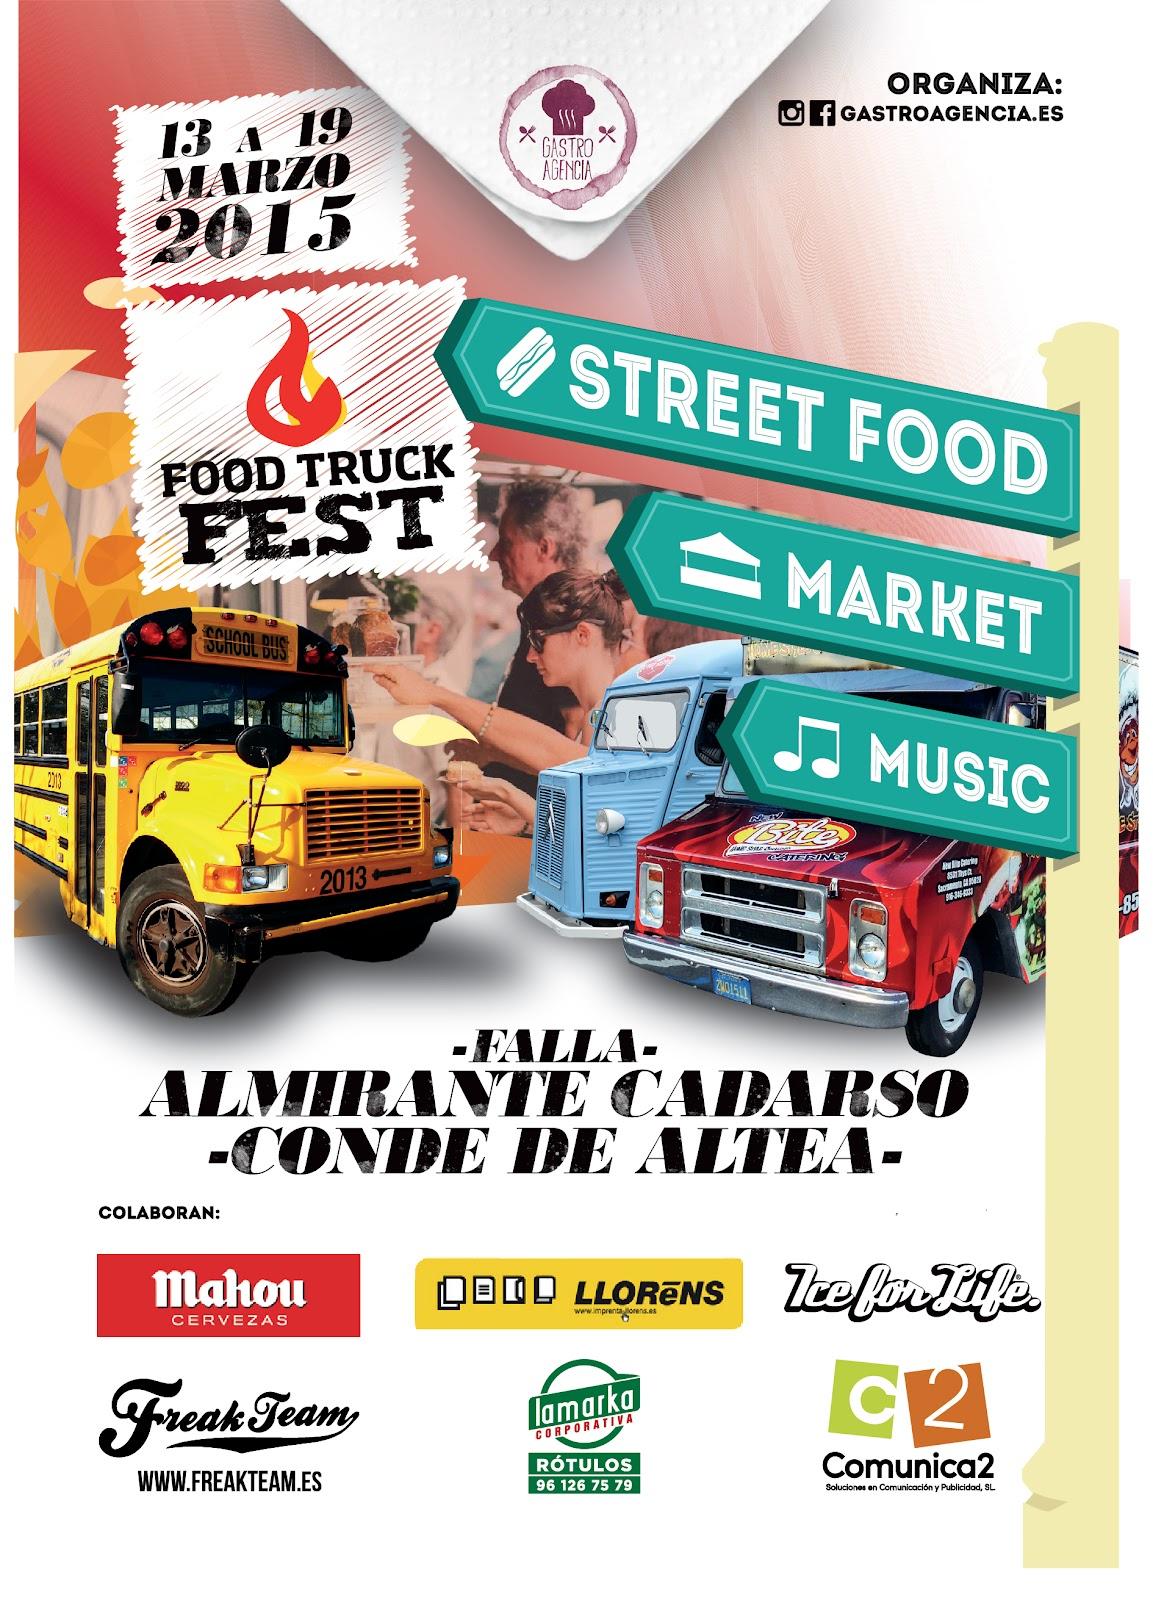 C:\Users\Gonzalo\AppData\Local\Temp\flyer FOOD TRUCK FEST-01.jpg